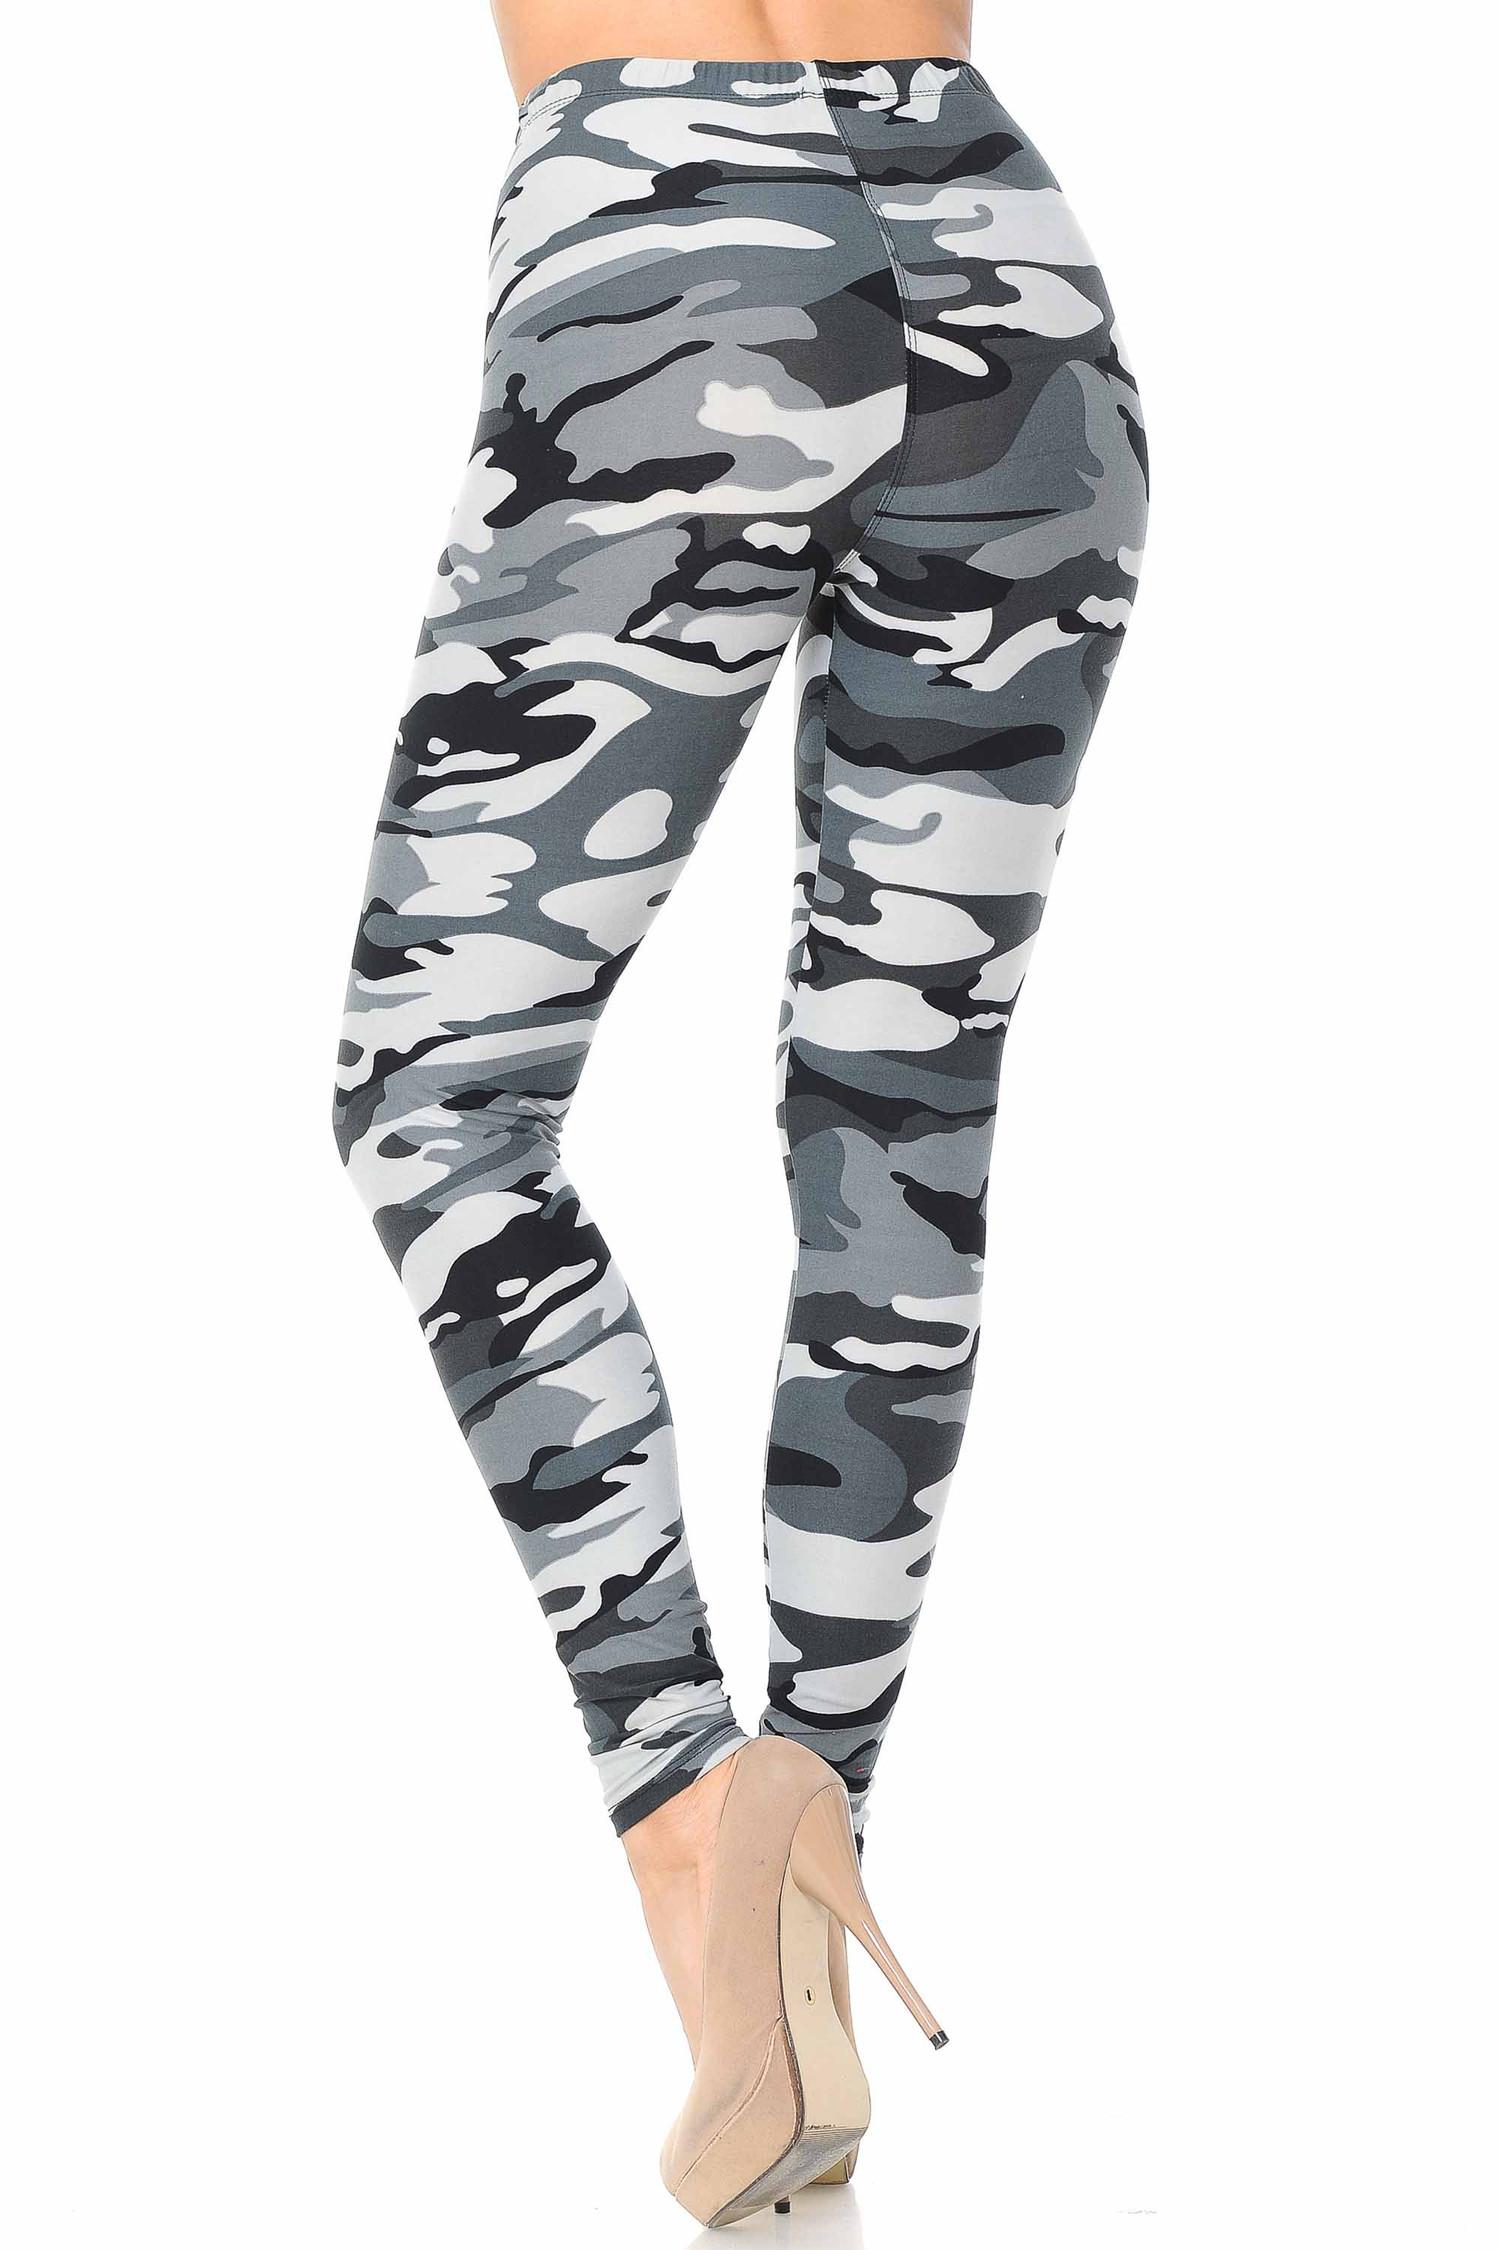 Brushed  Charcoal Camouflage Leggings